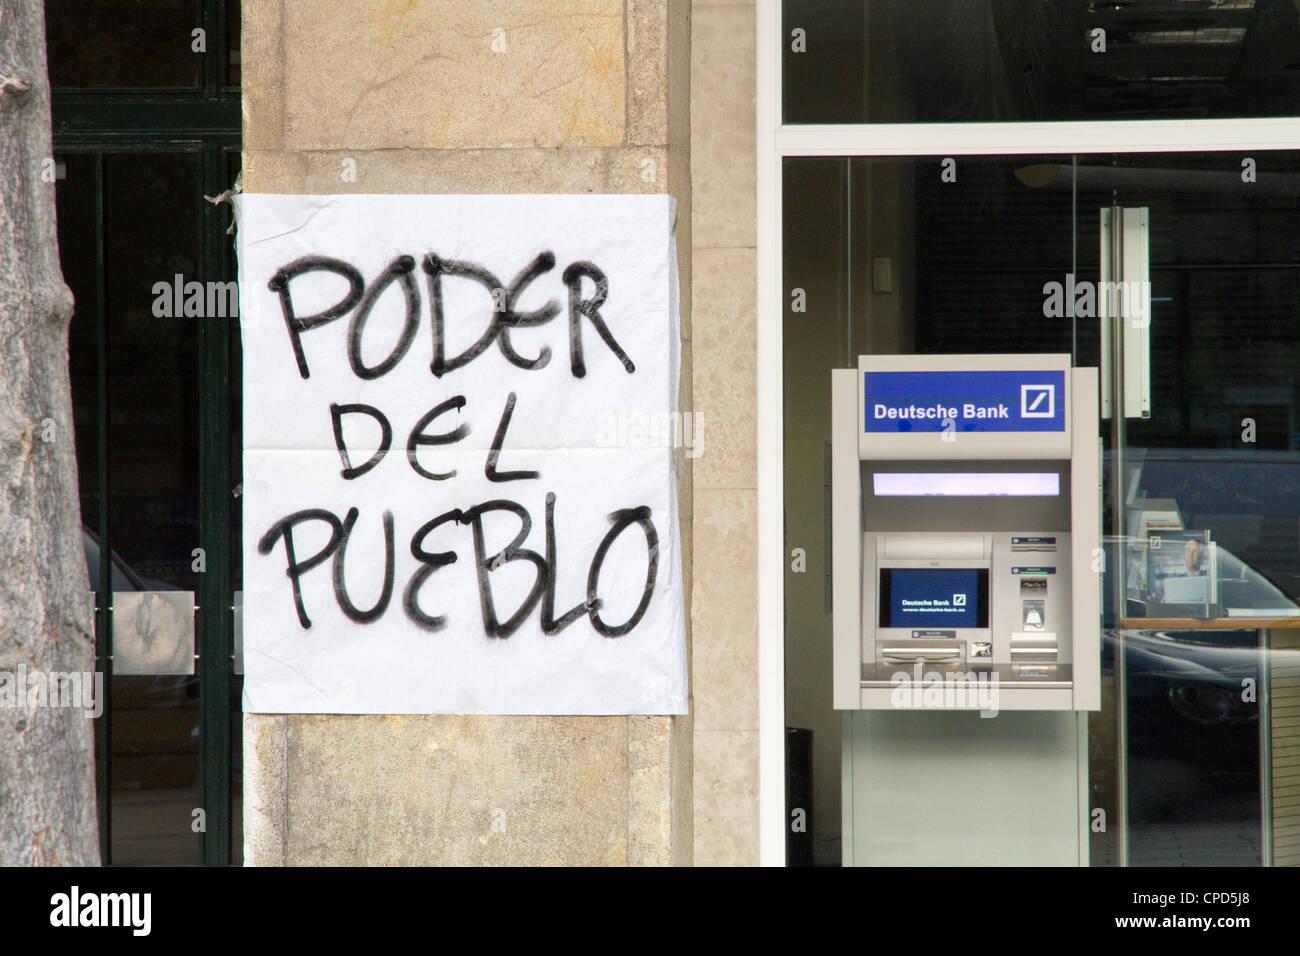 Protest message 'Power to people''poder del pueblo' near the deutsche Bank cash machine Spain - Stock Image